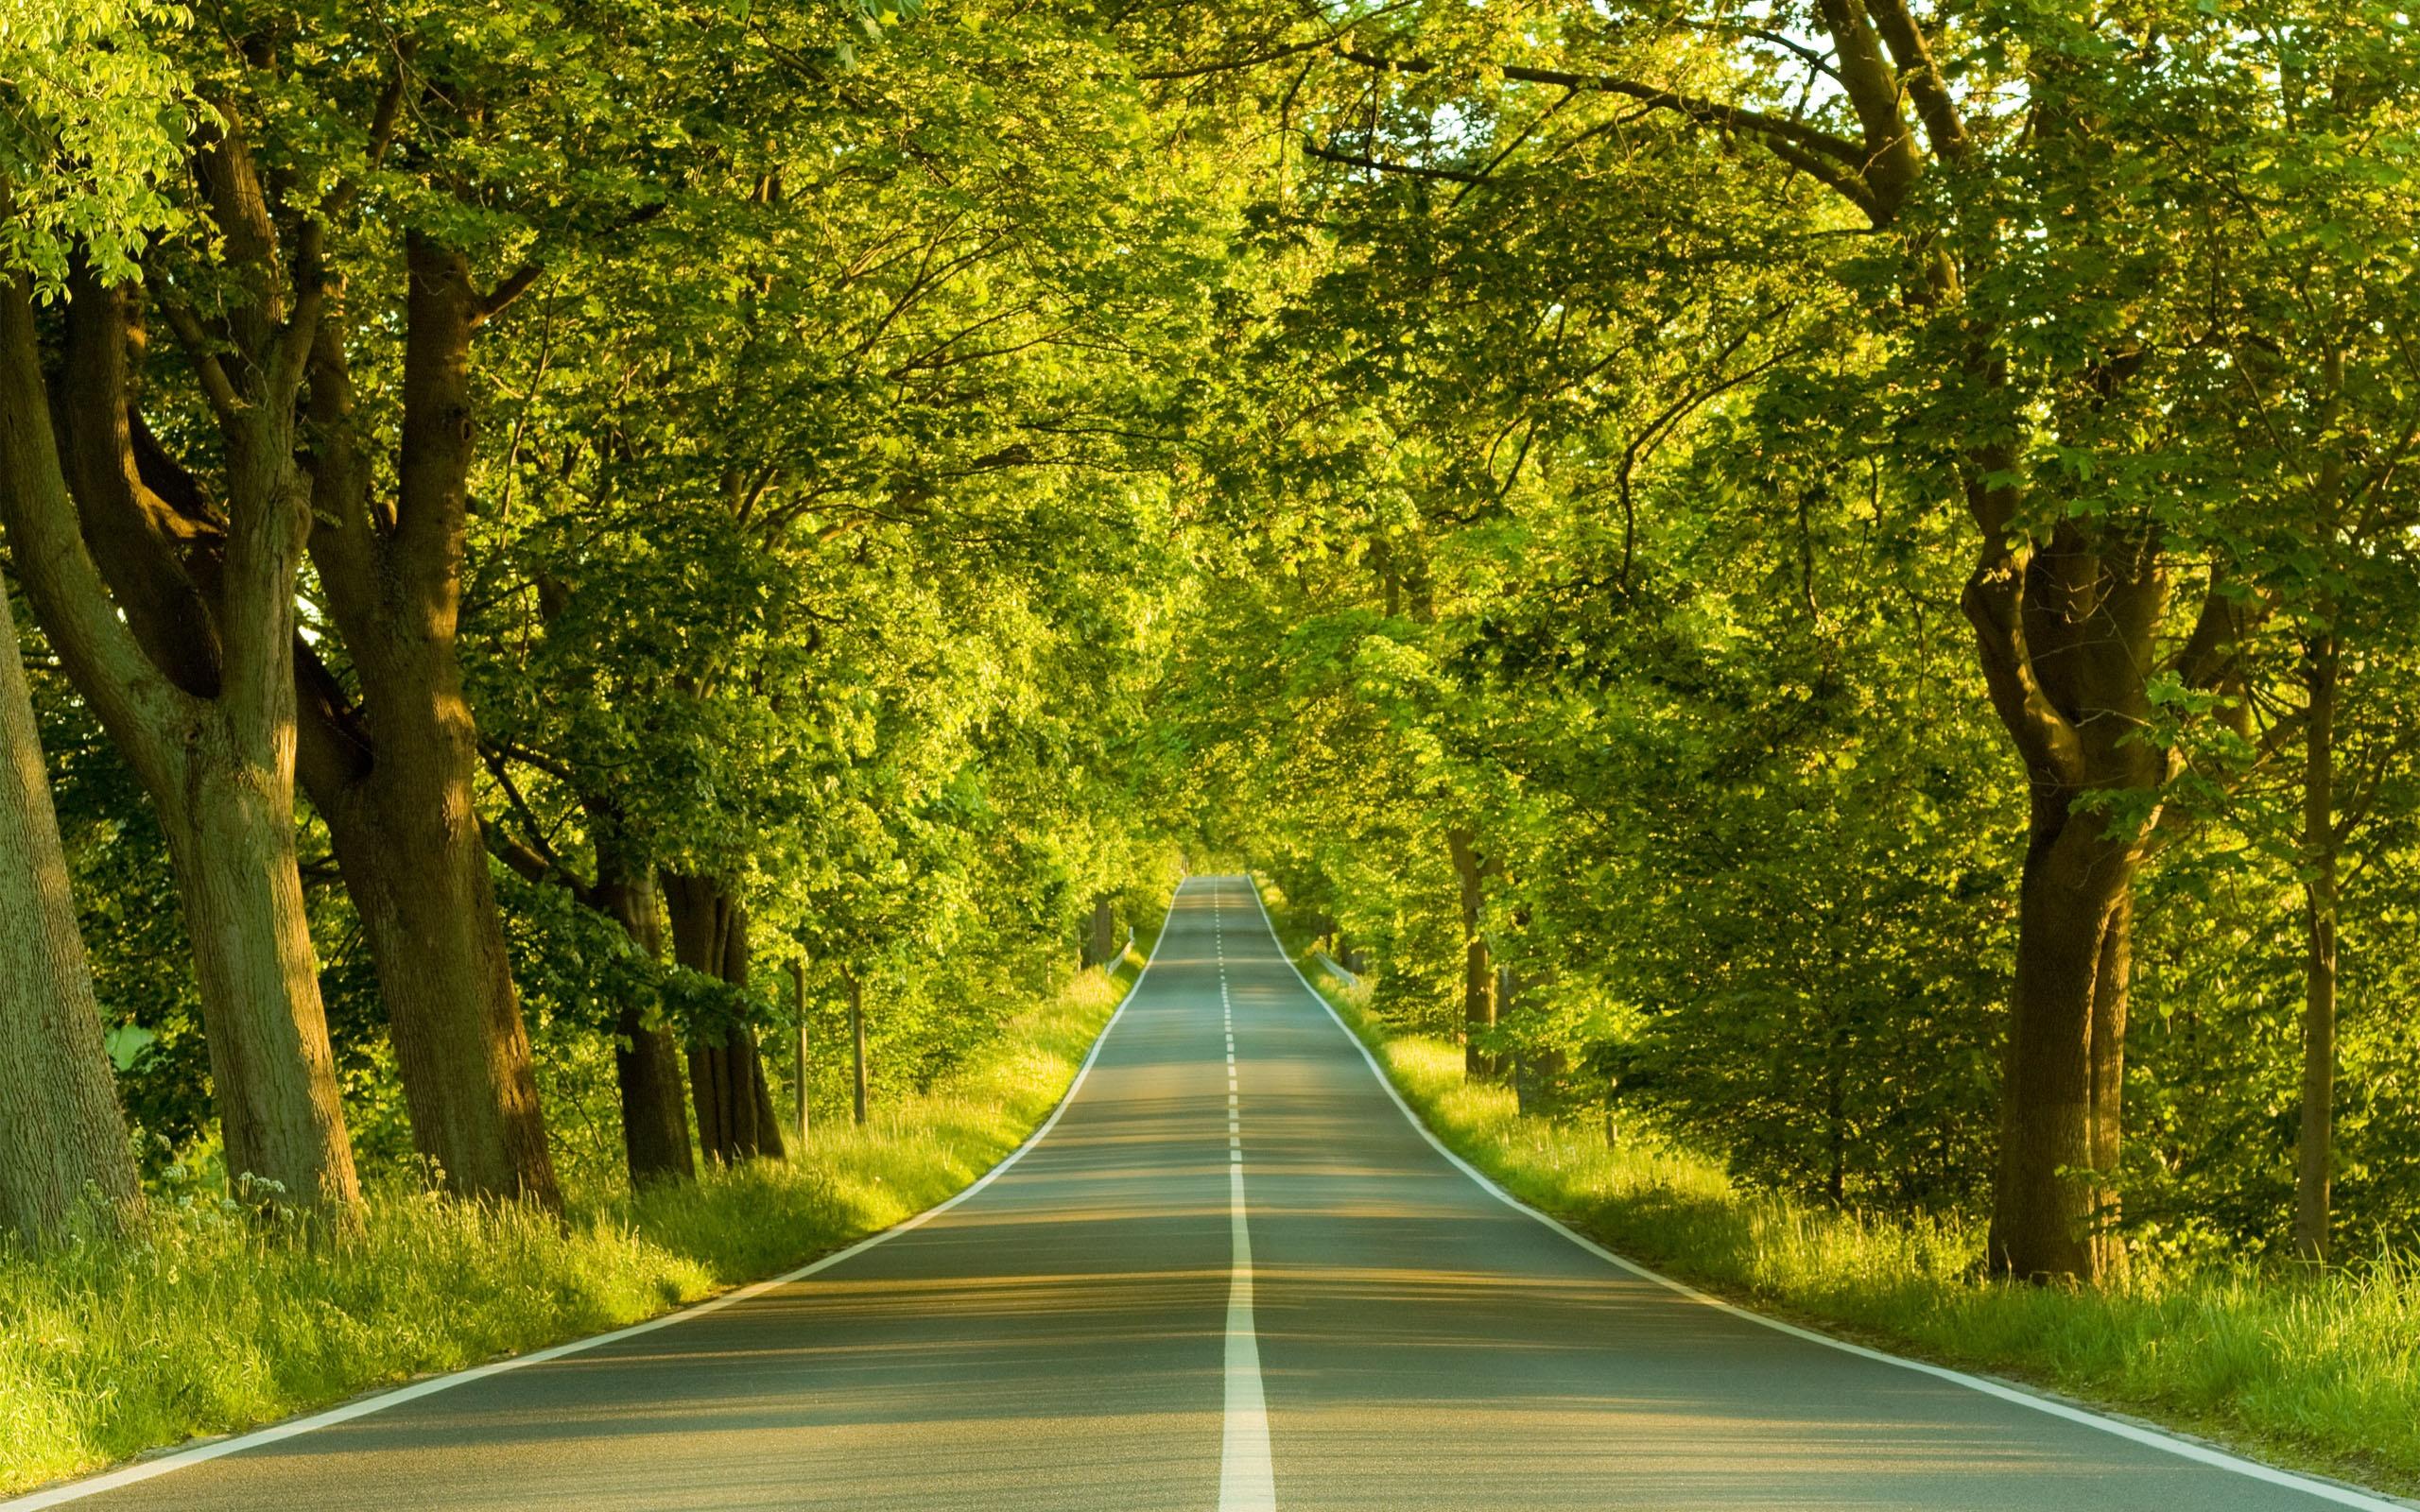 My Summer Love Road desktop wallpapers 800x600 My Summer Love Road 2560x1600